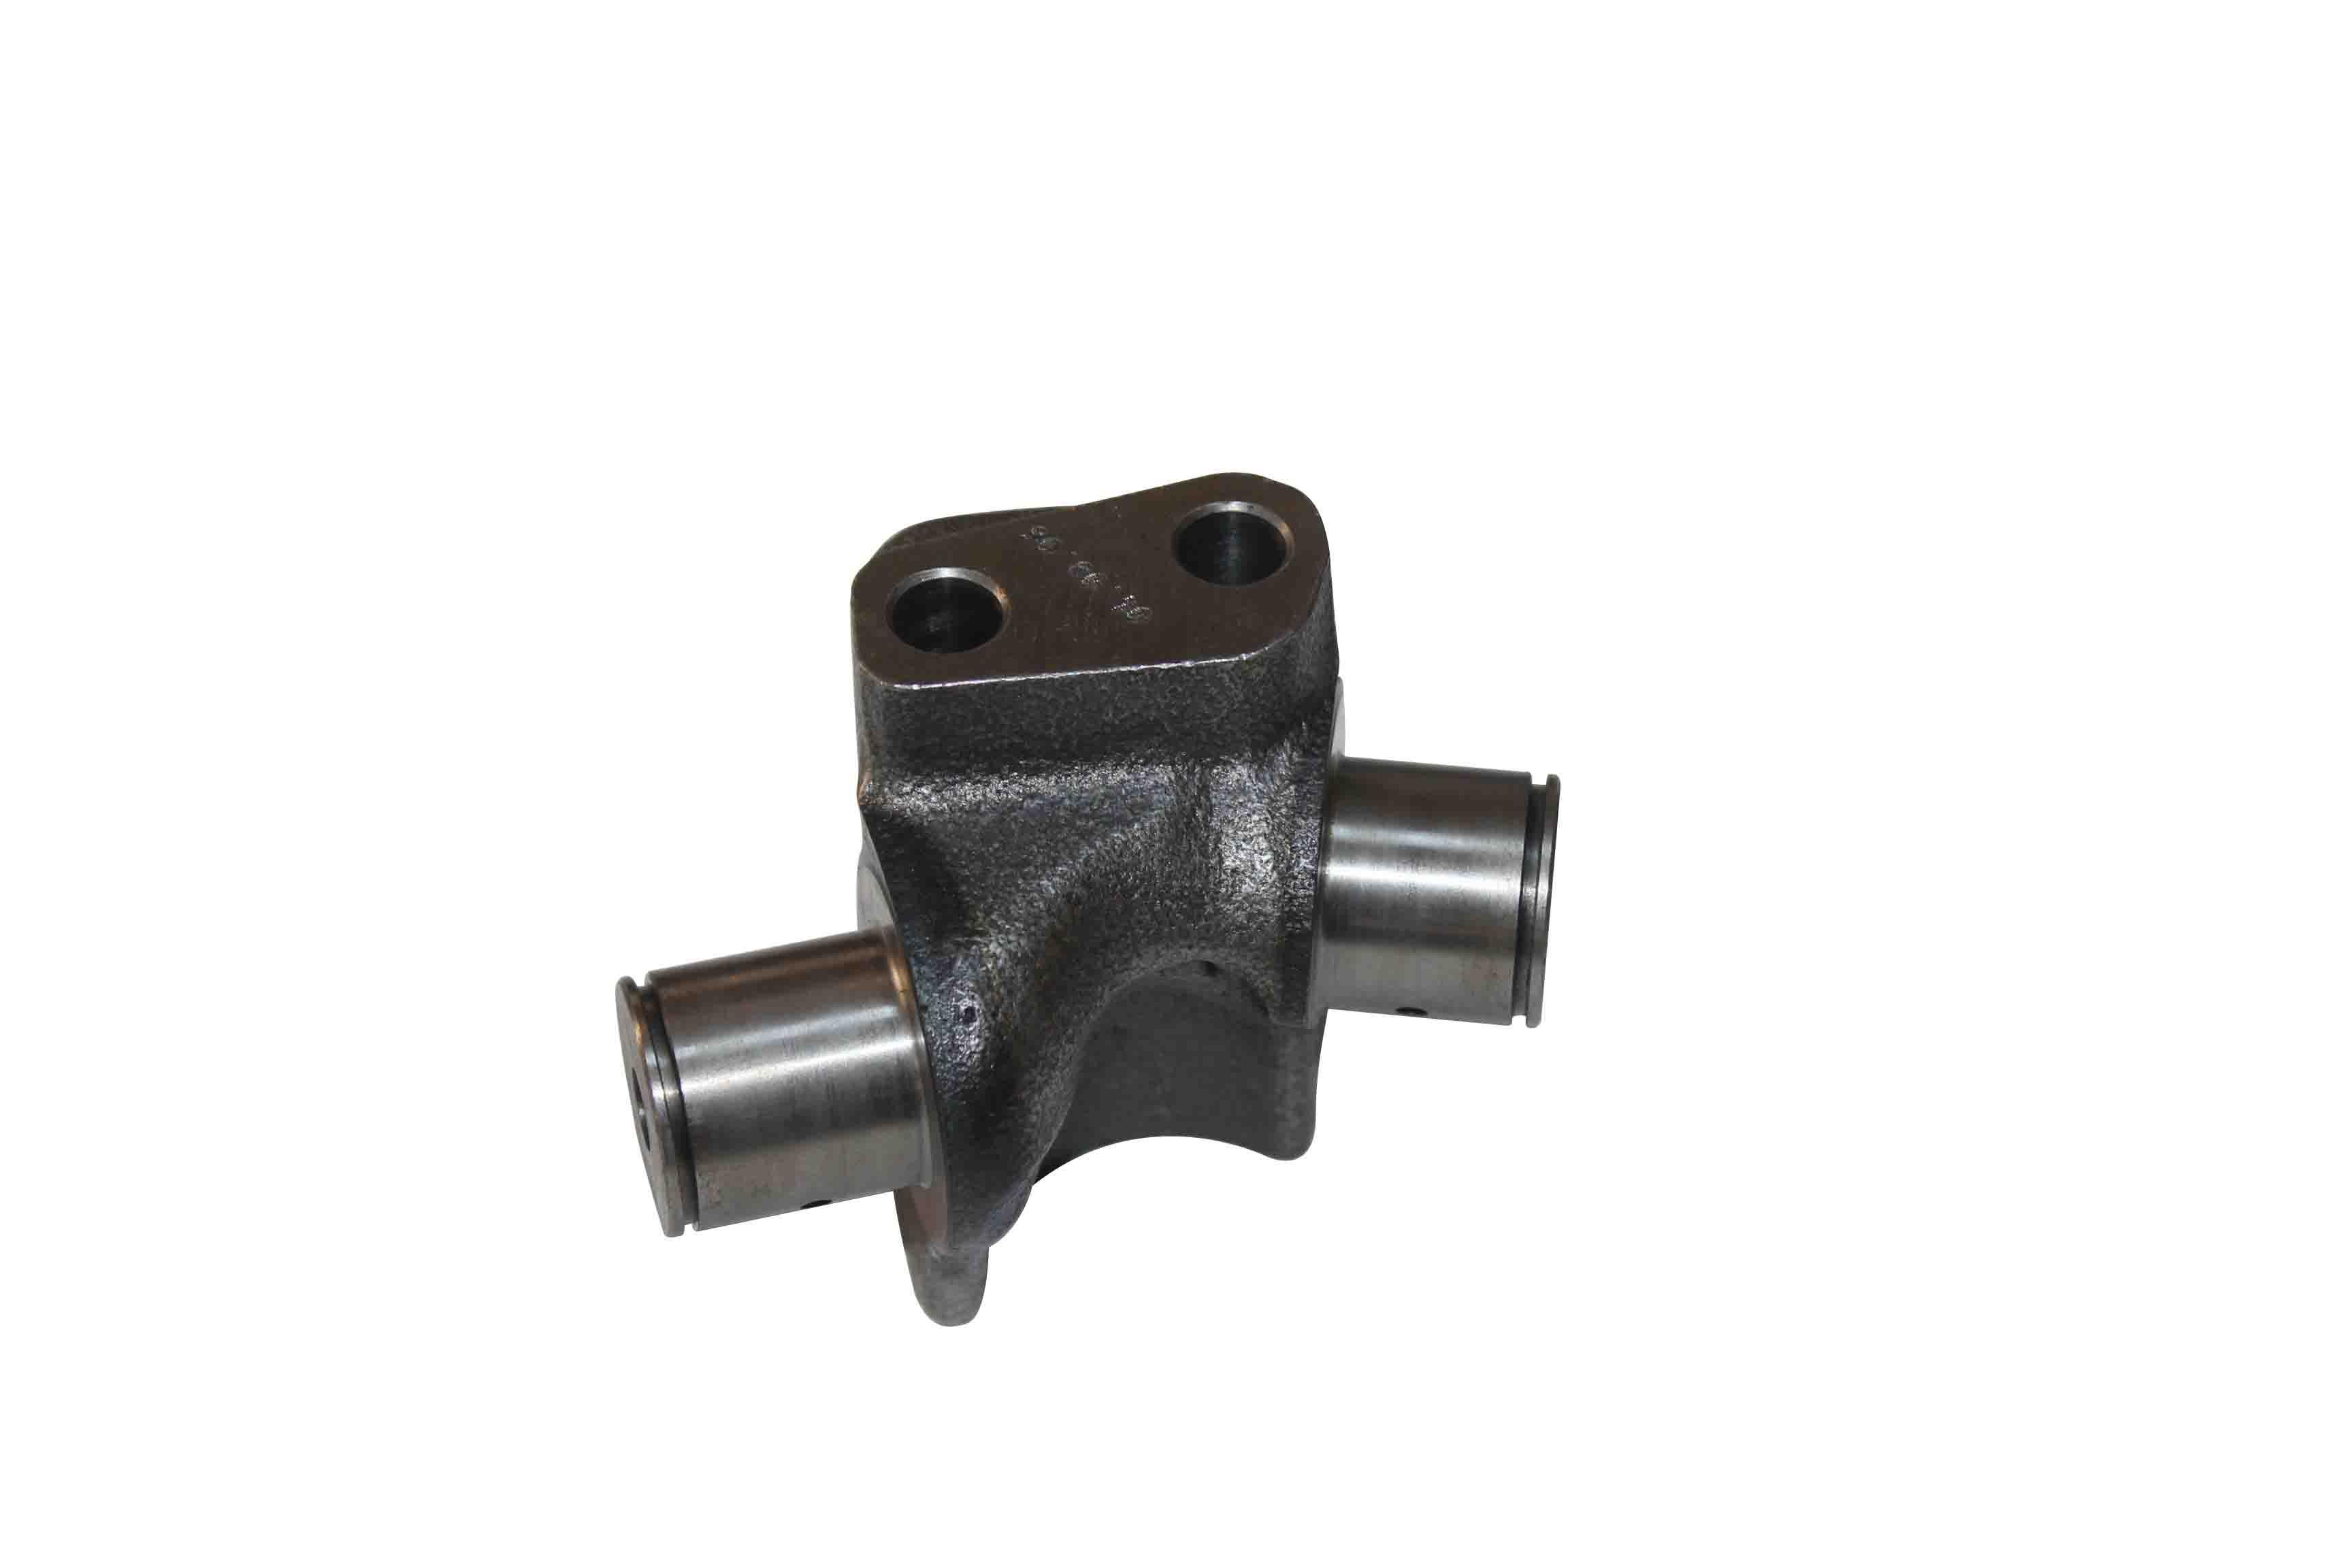 MERCEDES BEARING BRACKET FOR ROCKER ARM ARC-EXP.304021 5410501236